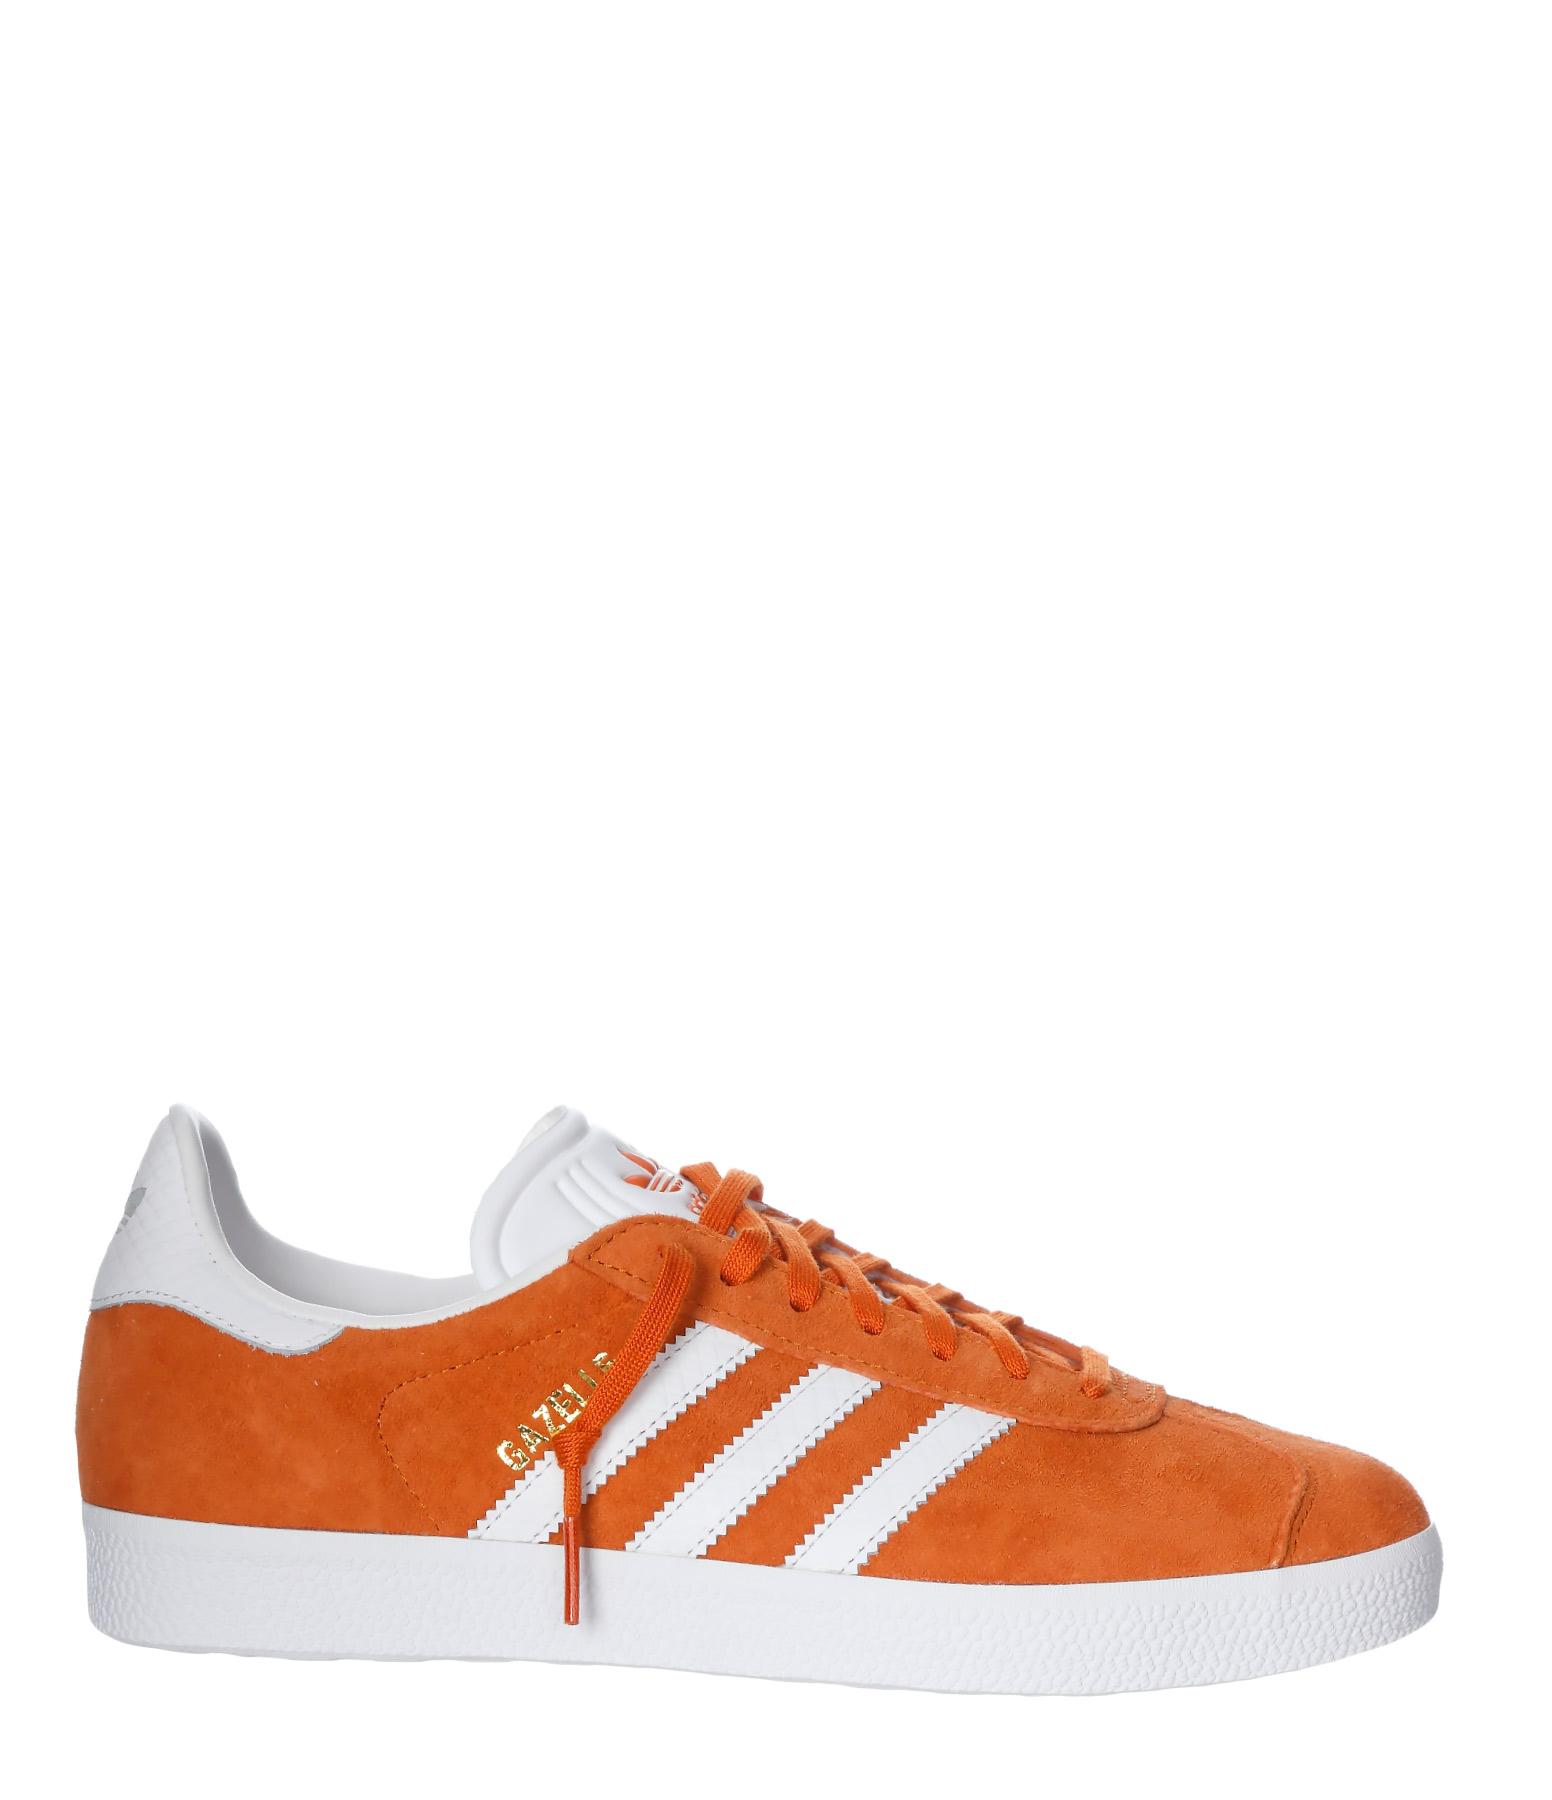 Baskets Gazelle Tactile Orange